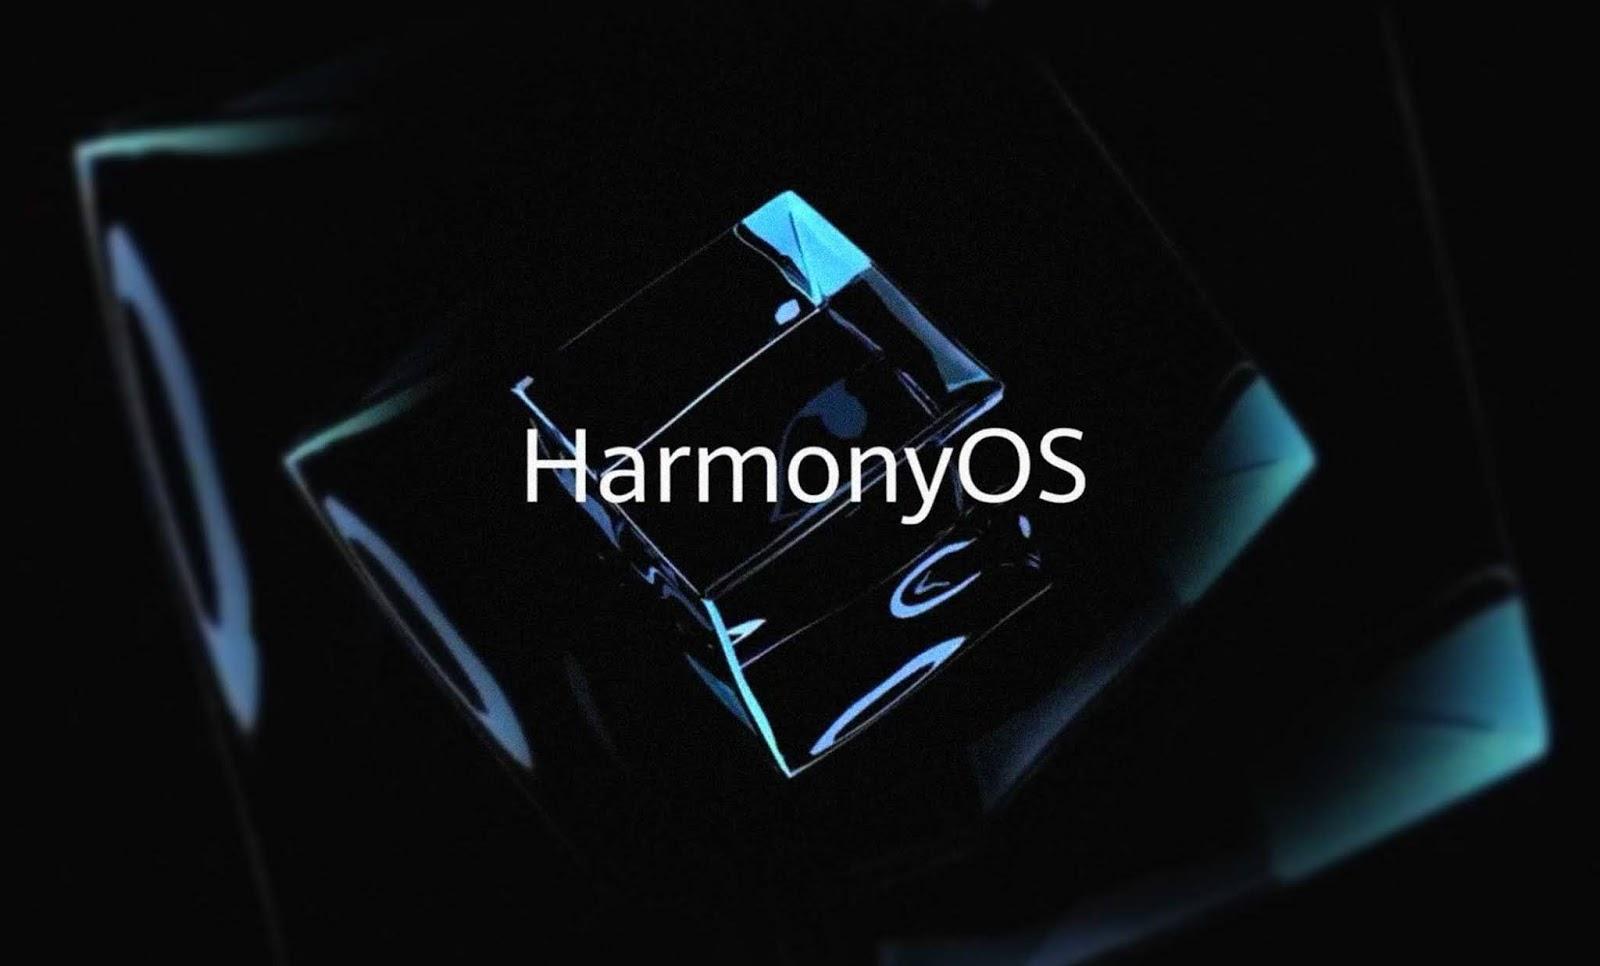 هواوي تطلق بشكل رسمي نظامها الجديد HarmonyOS